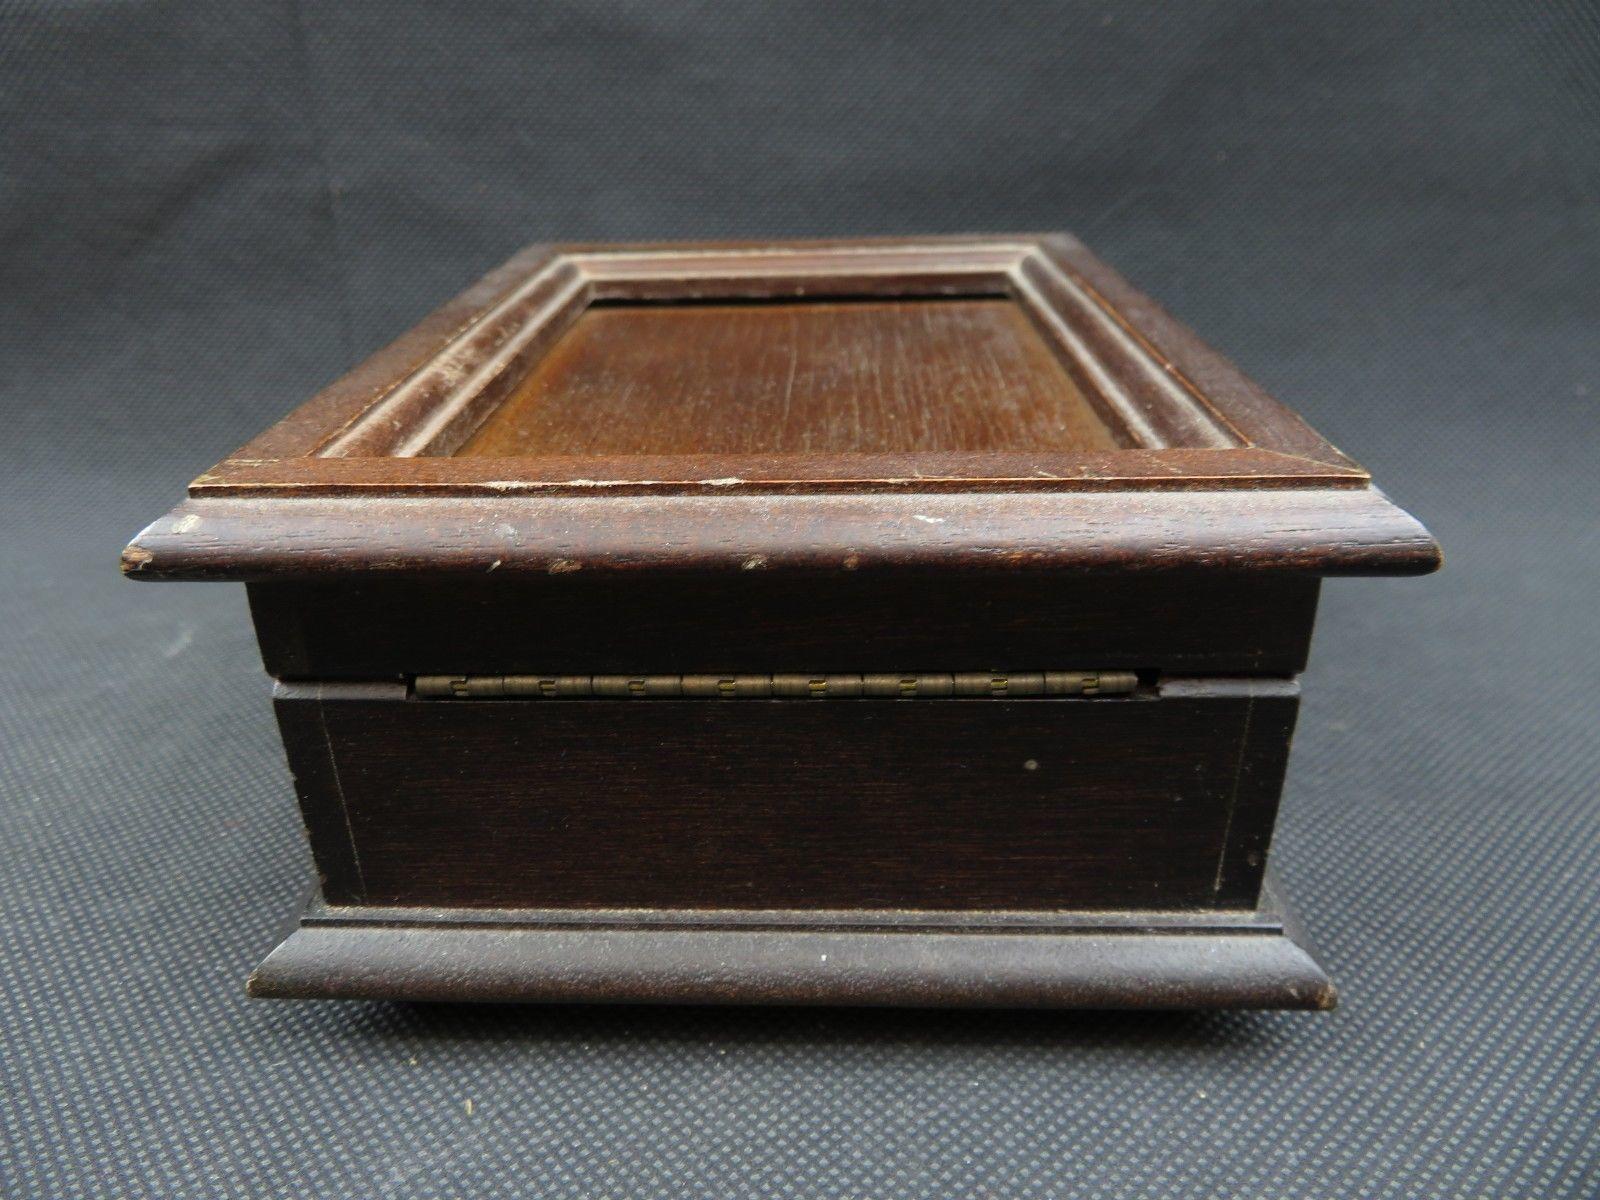 Vintage wood music box The San Francisco Music Box Company Mid Century deco